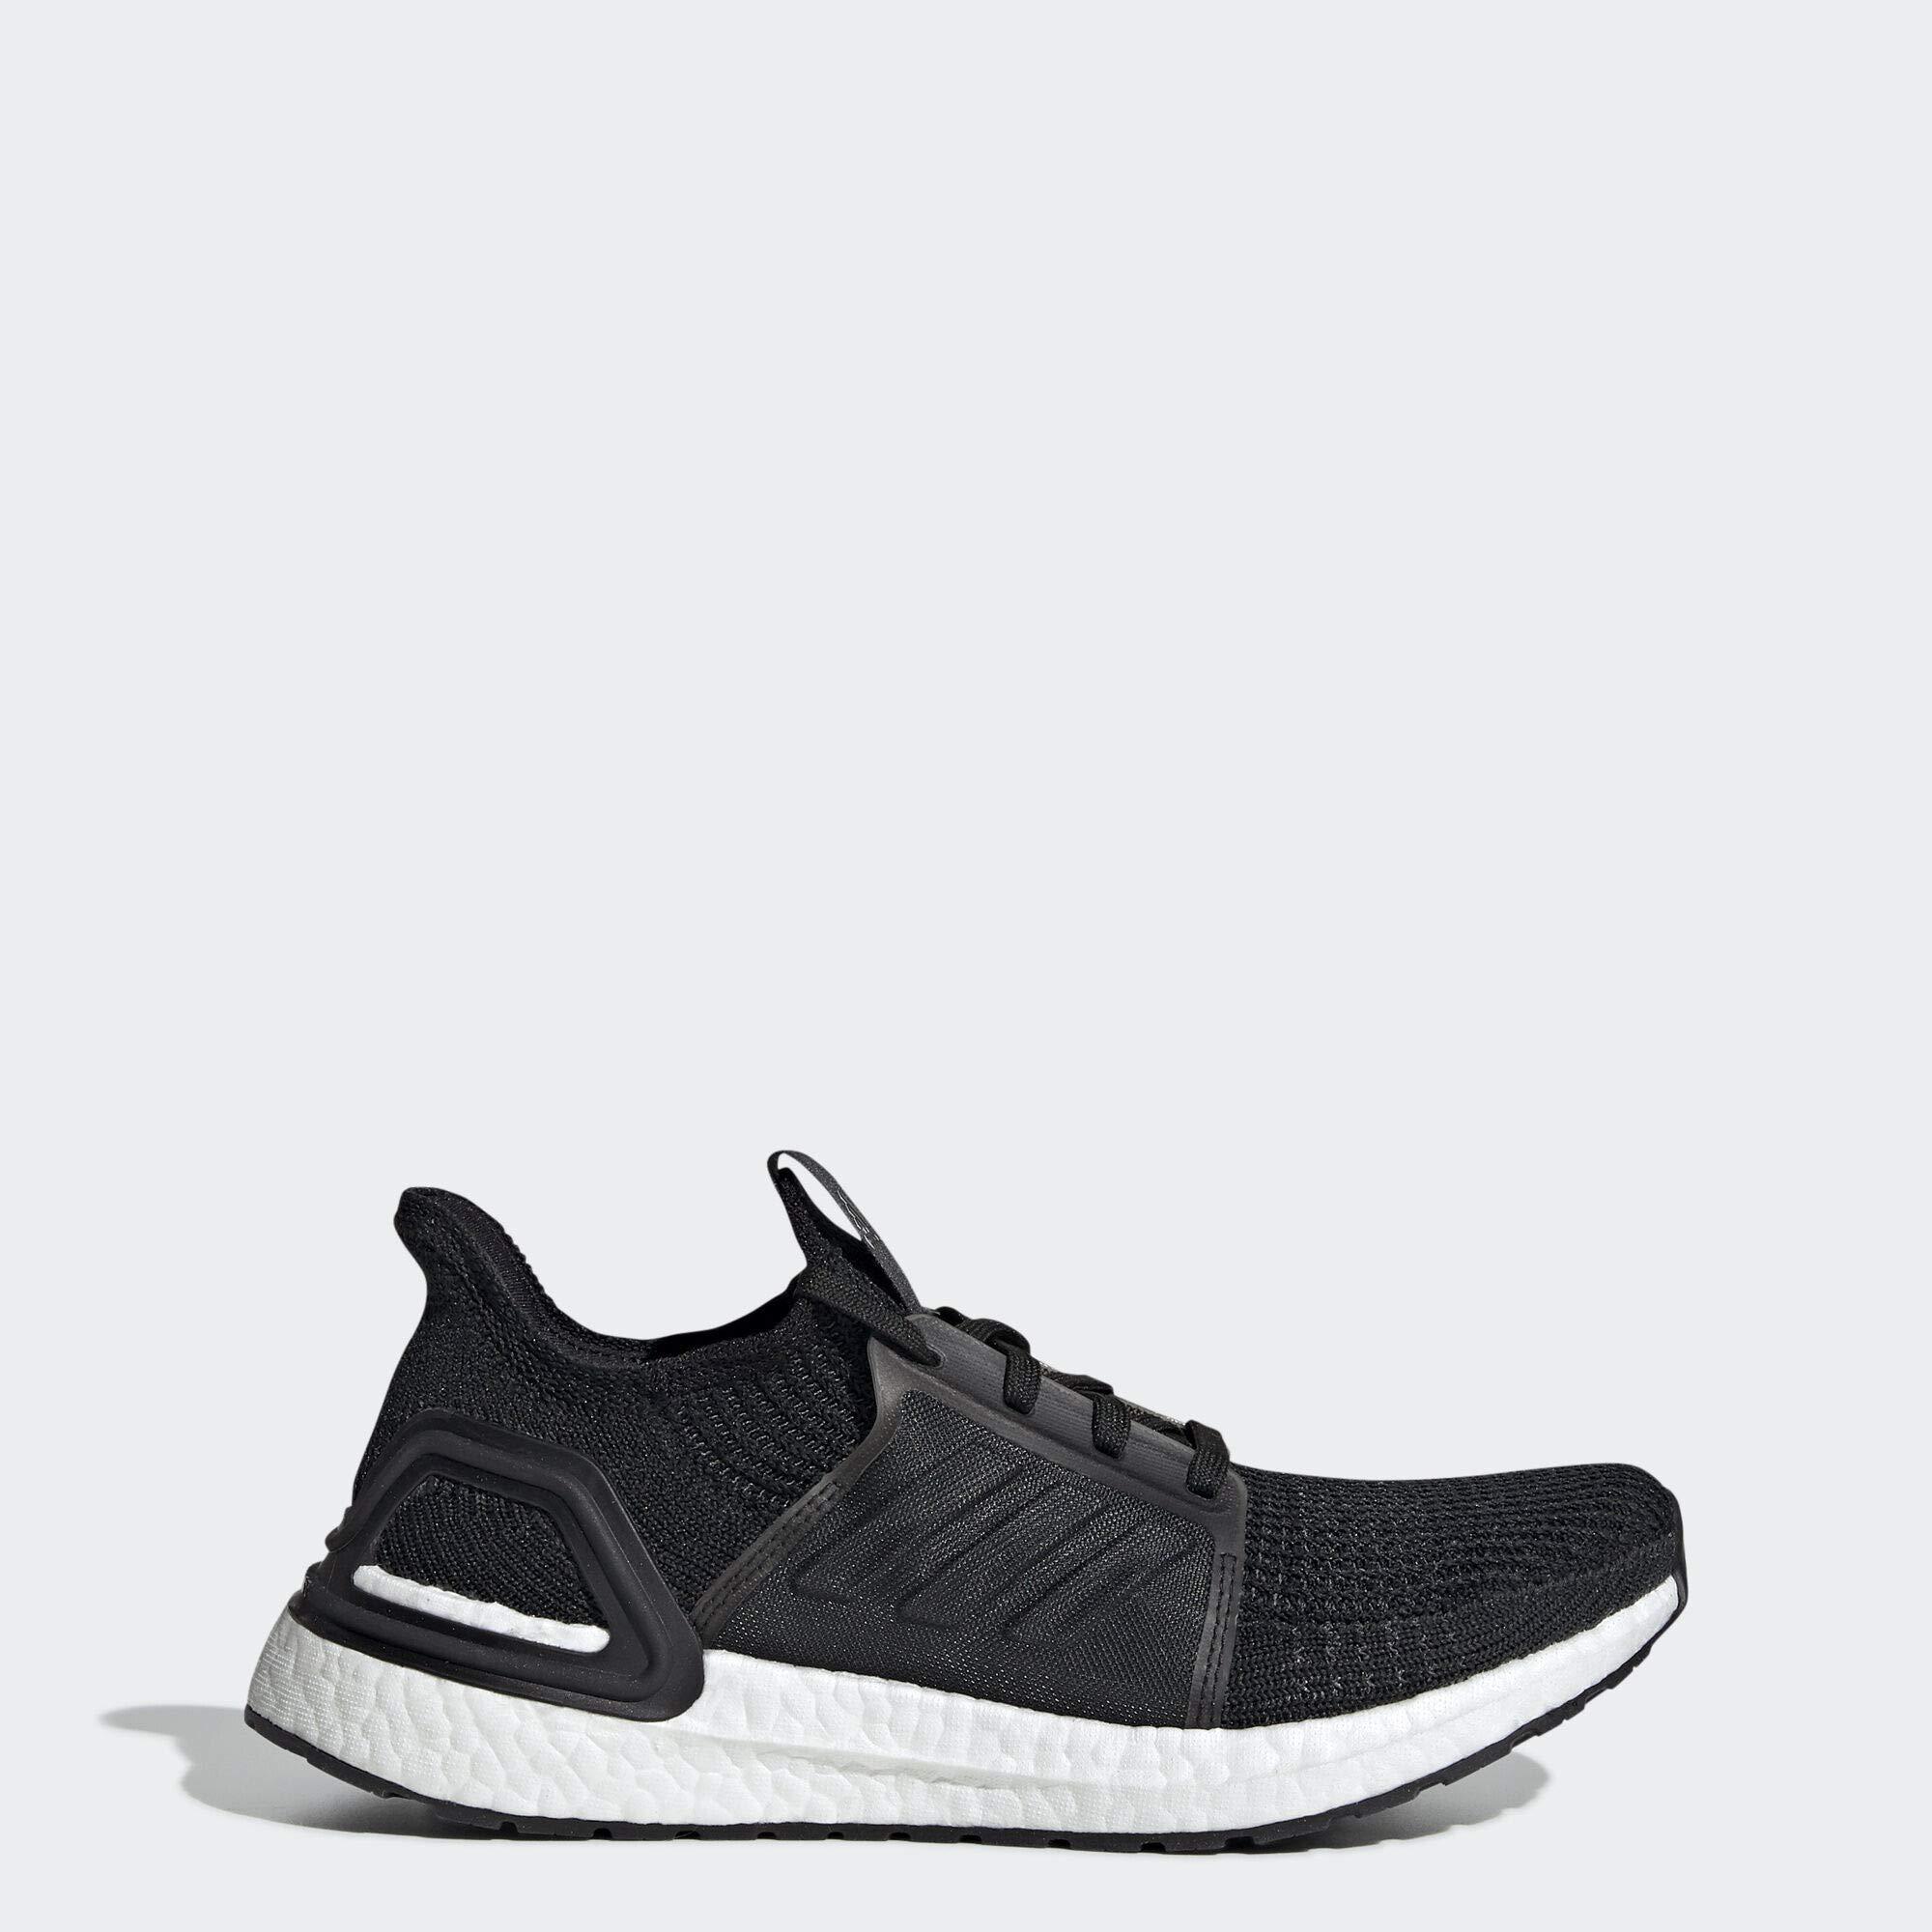 adidas Women's Ultraboost 19 Running Shoe, Black/Grey/Solar Orange, 7.5 M US by adidas